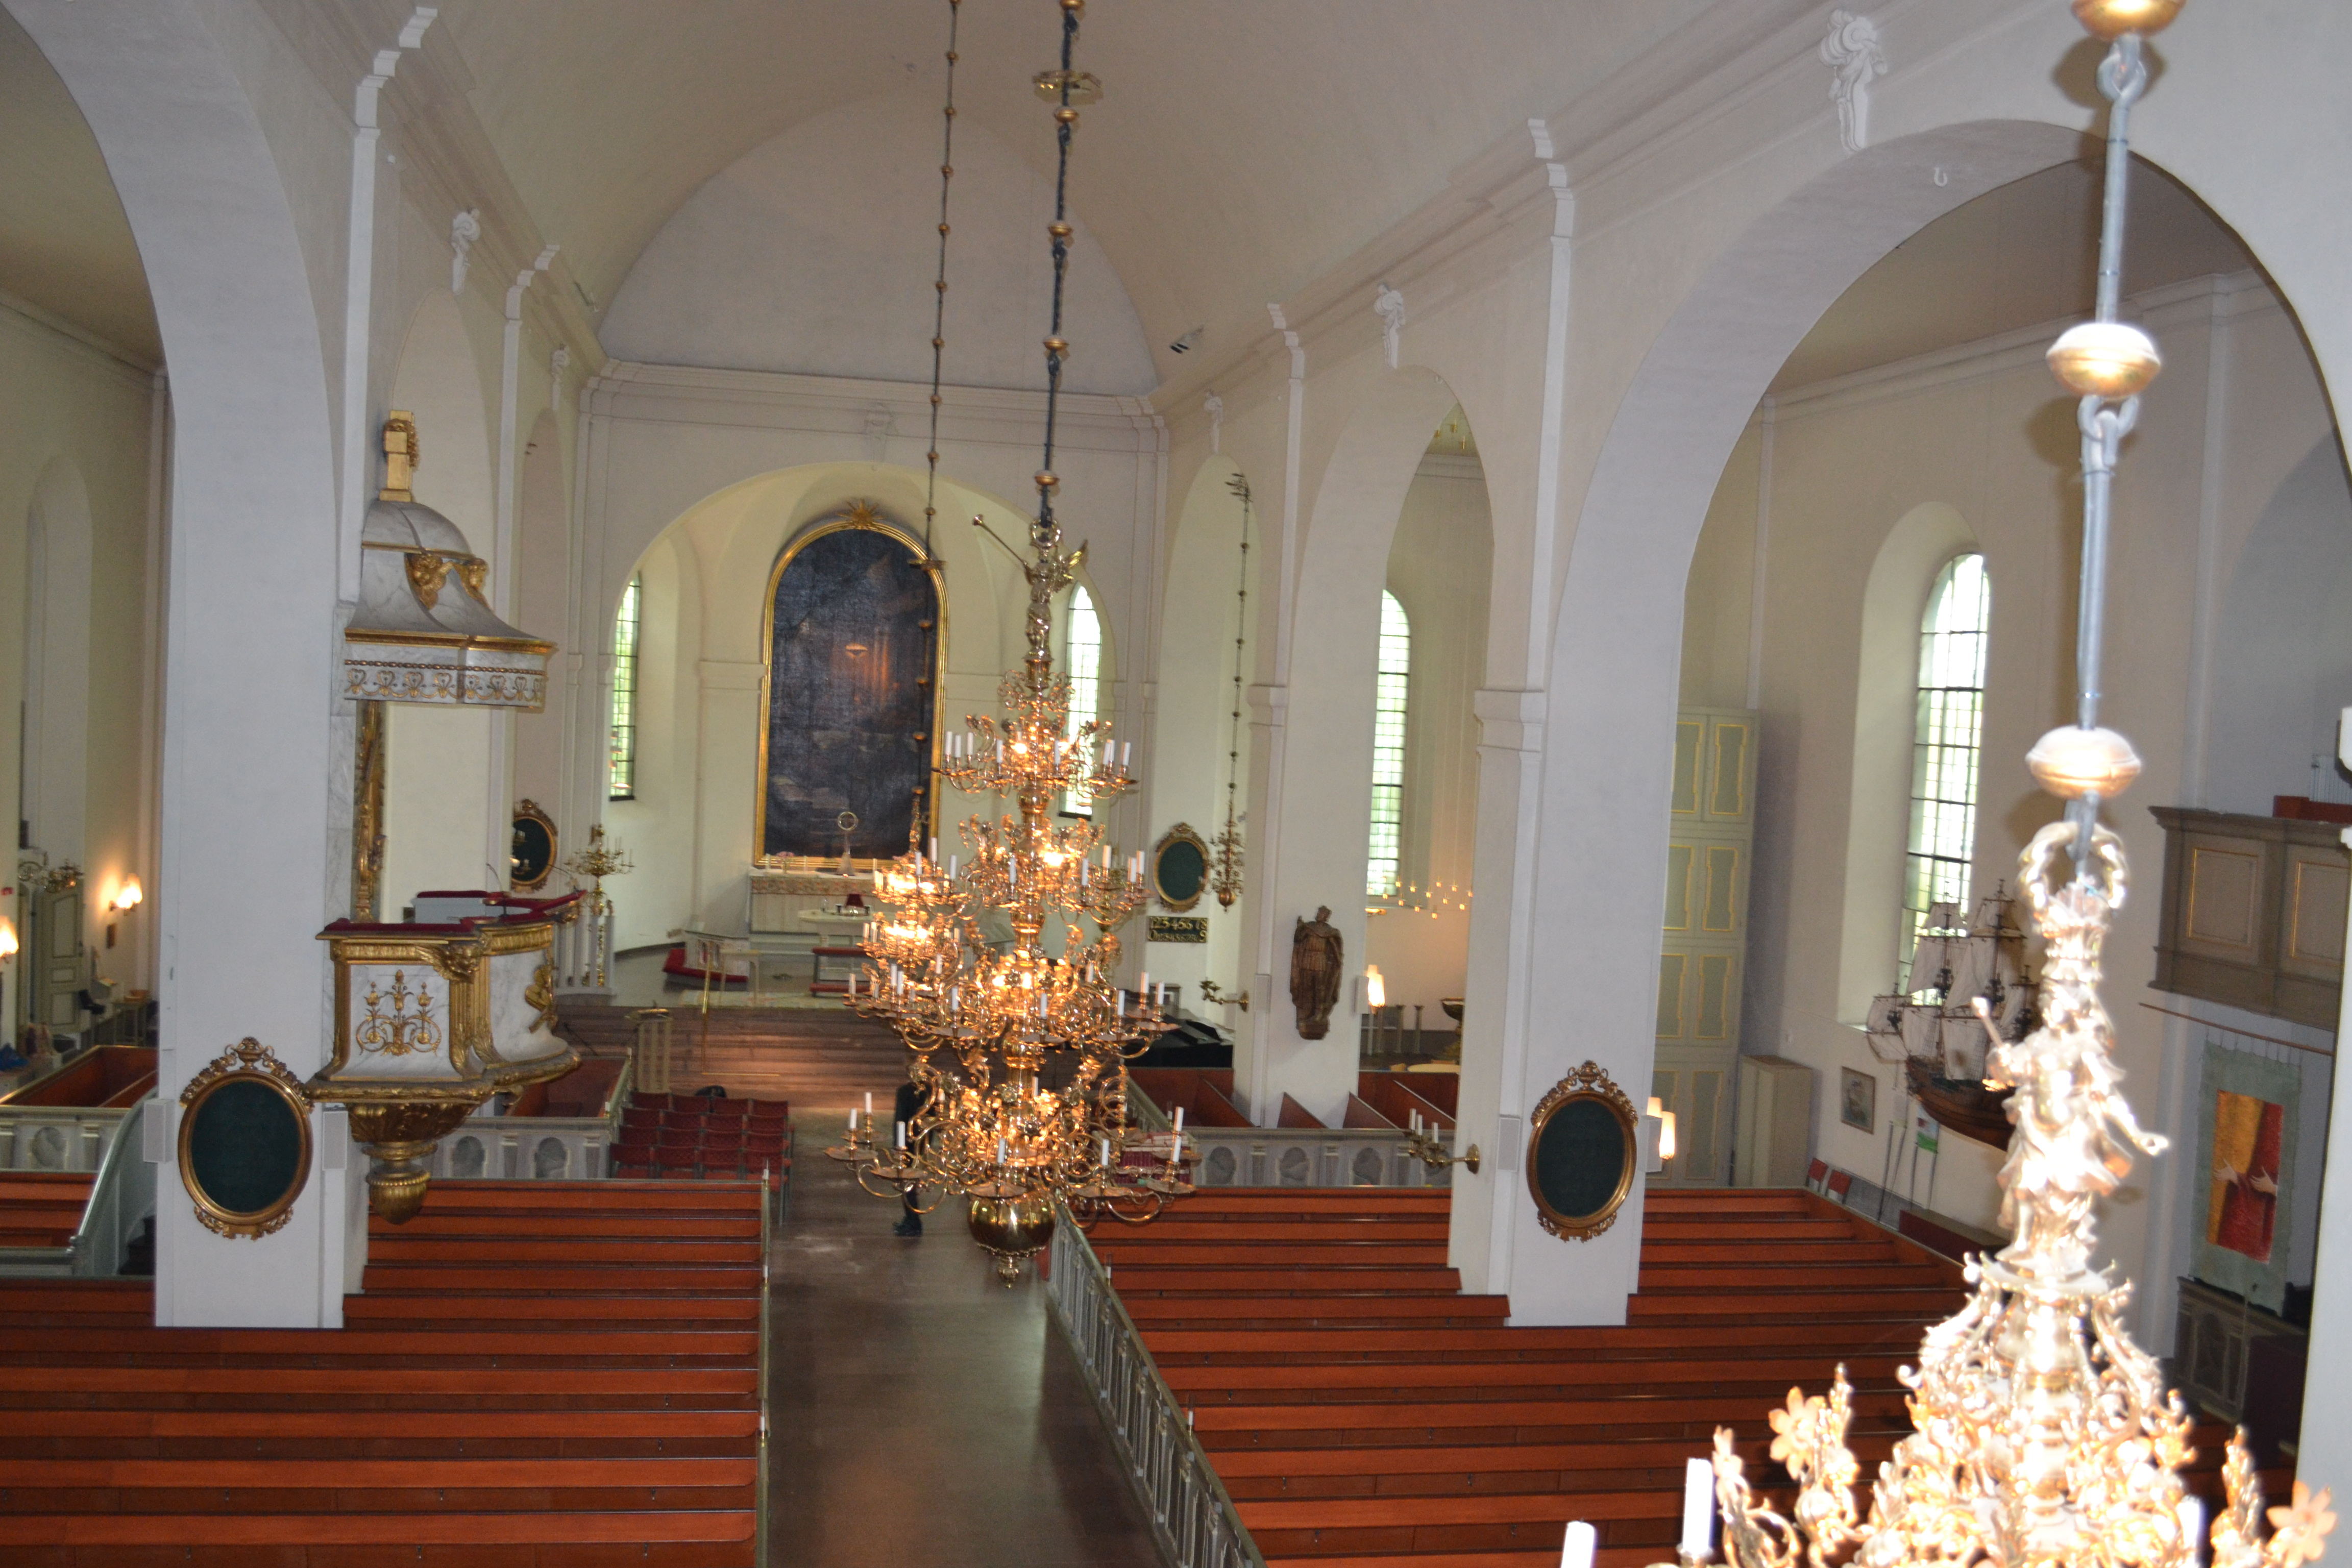 Fil:St Olai kyrka i Norrkping april omr-scanner.net Wikipedia